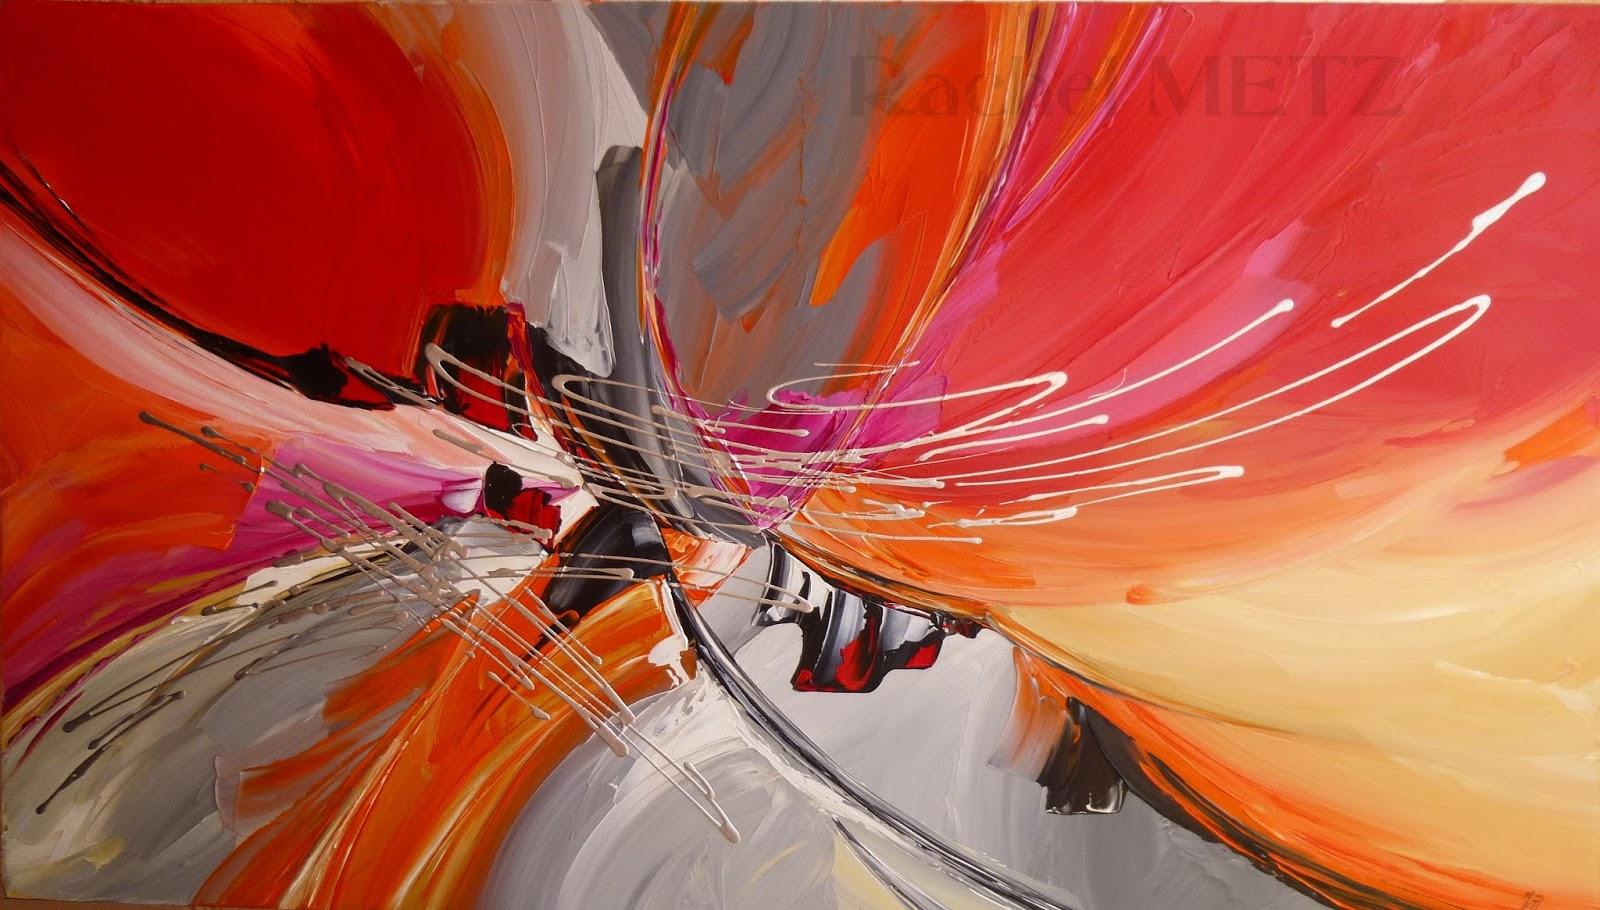 Rachel Metz - Artiste Peintre